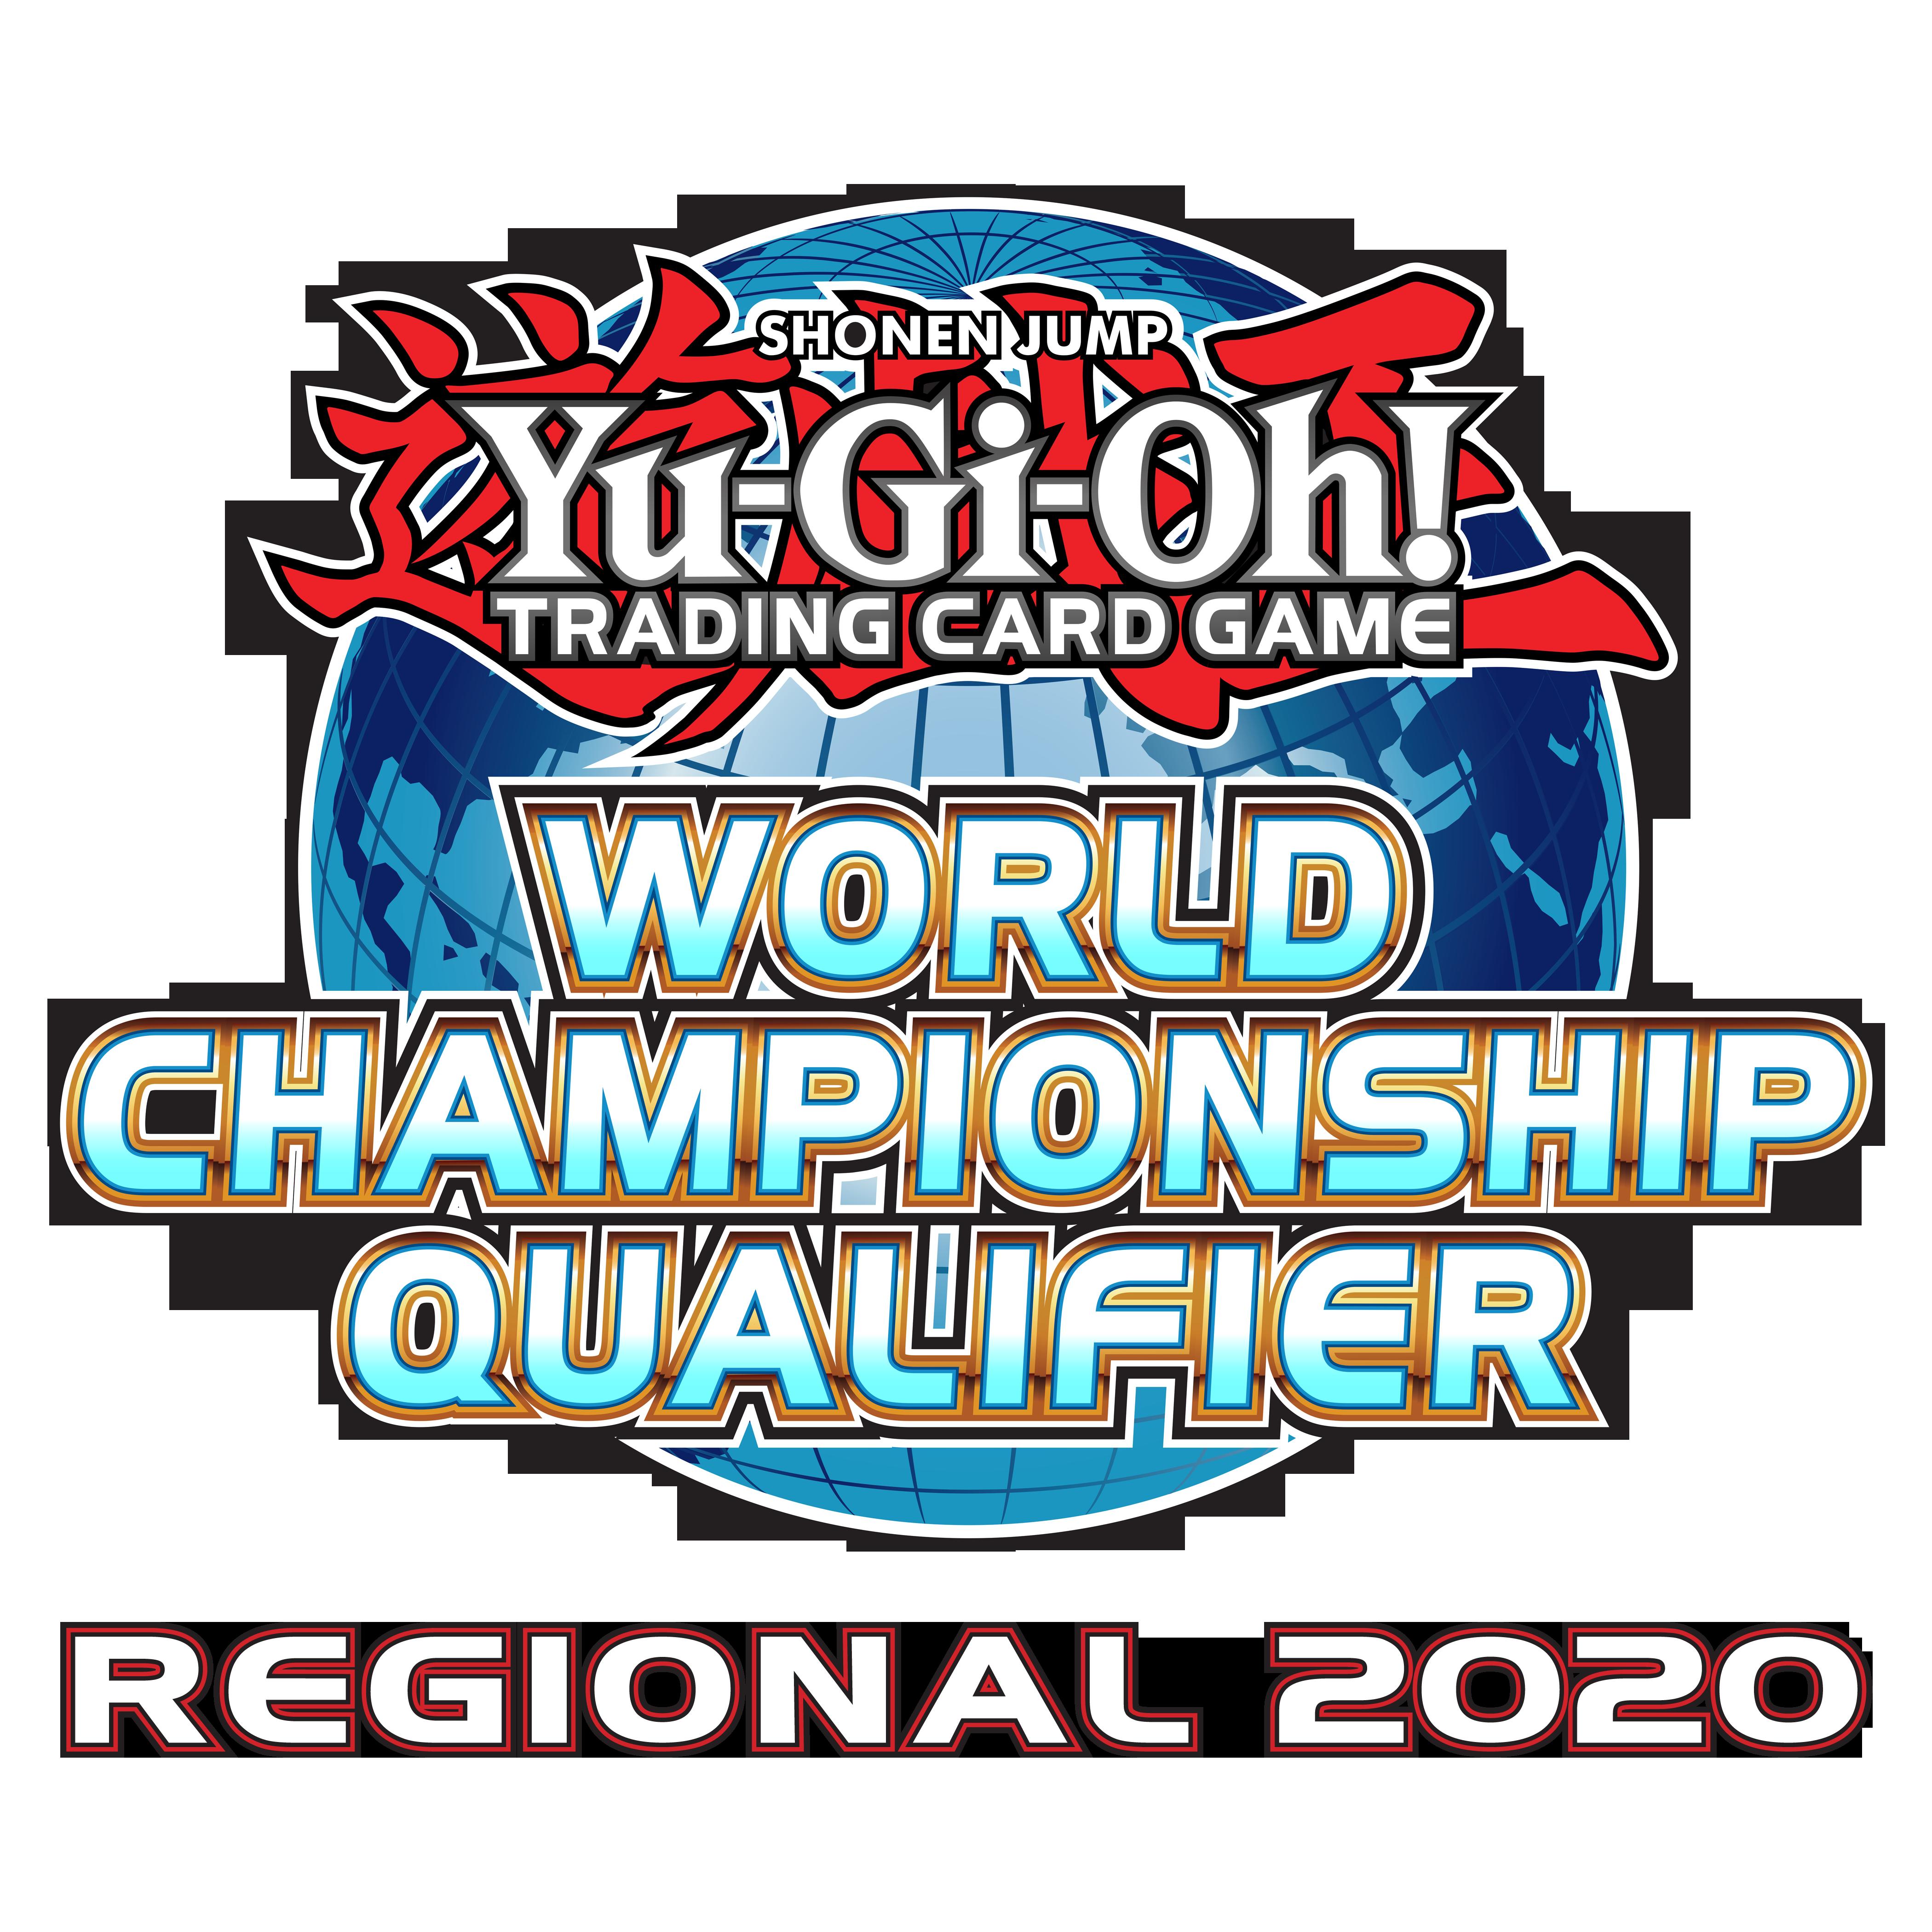 Yugioh Ban List 2020.2020 Wcq Regional Qualifiers Yu Gi Oh Trading Card Game